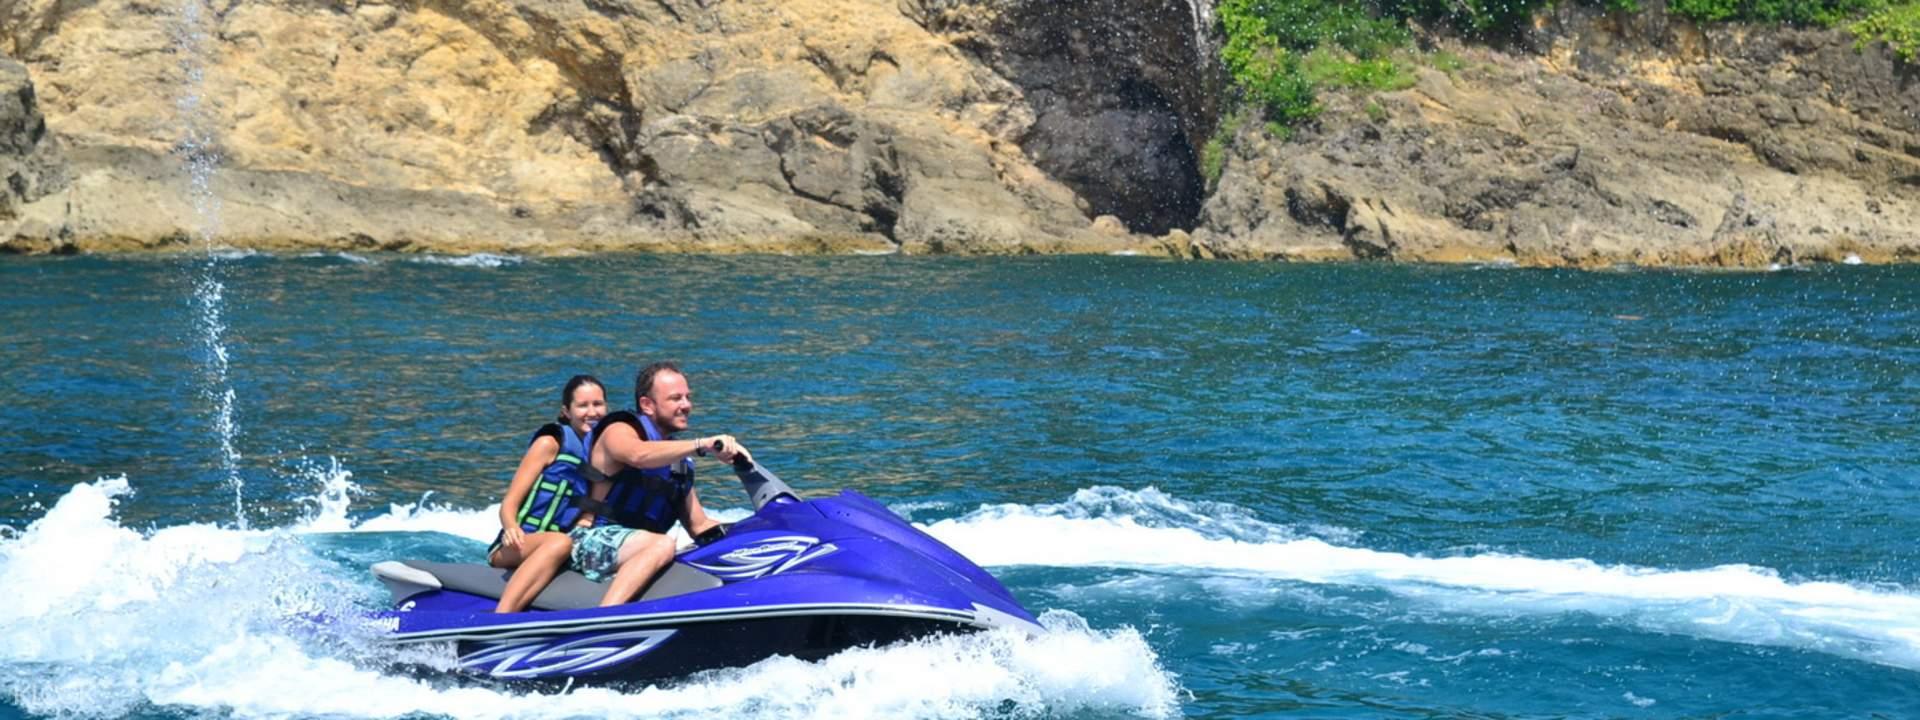 "Boracay Jet Ski Experience"""